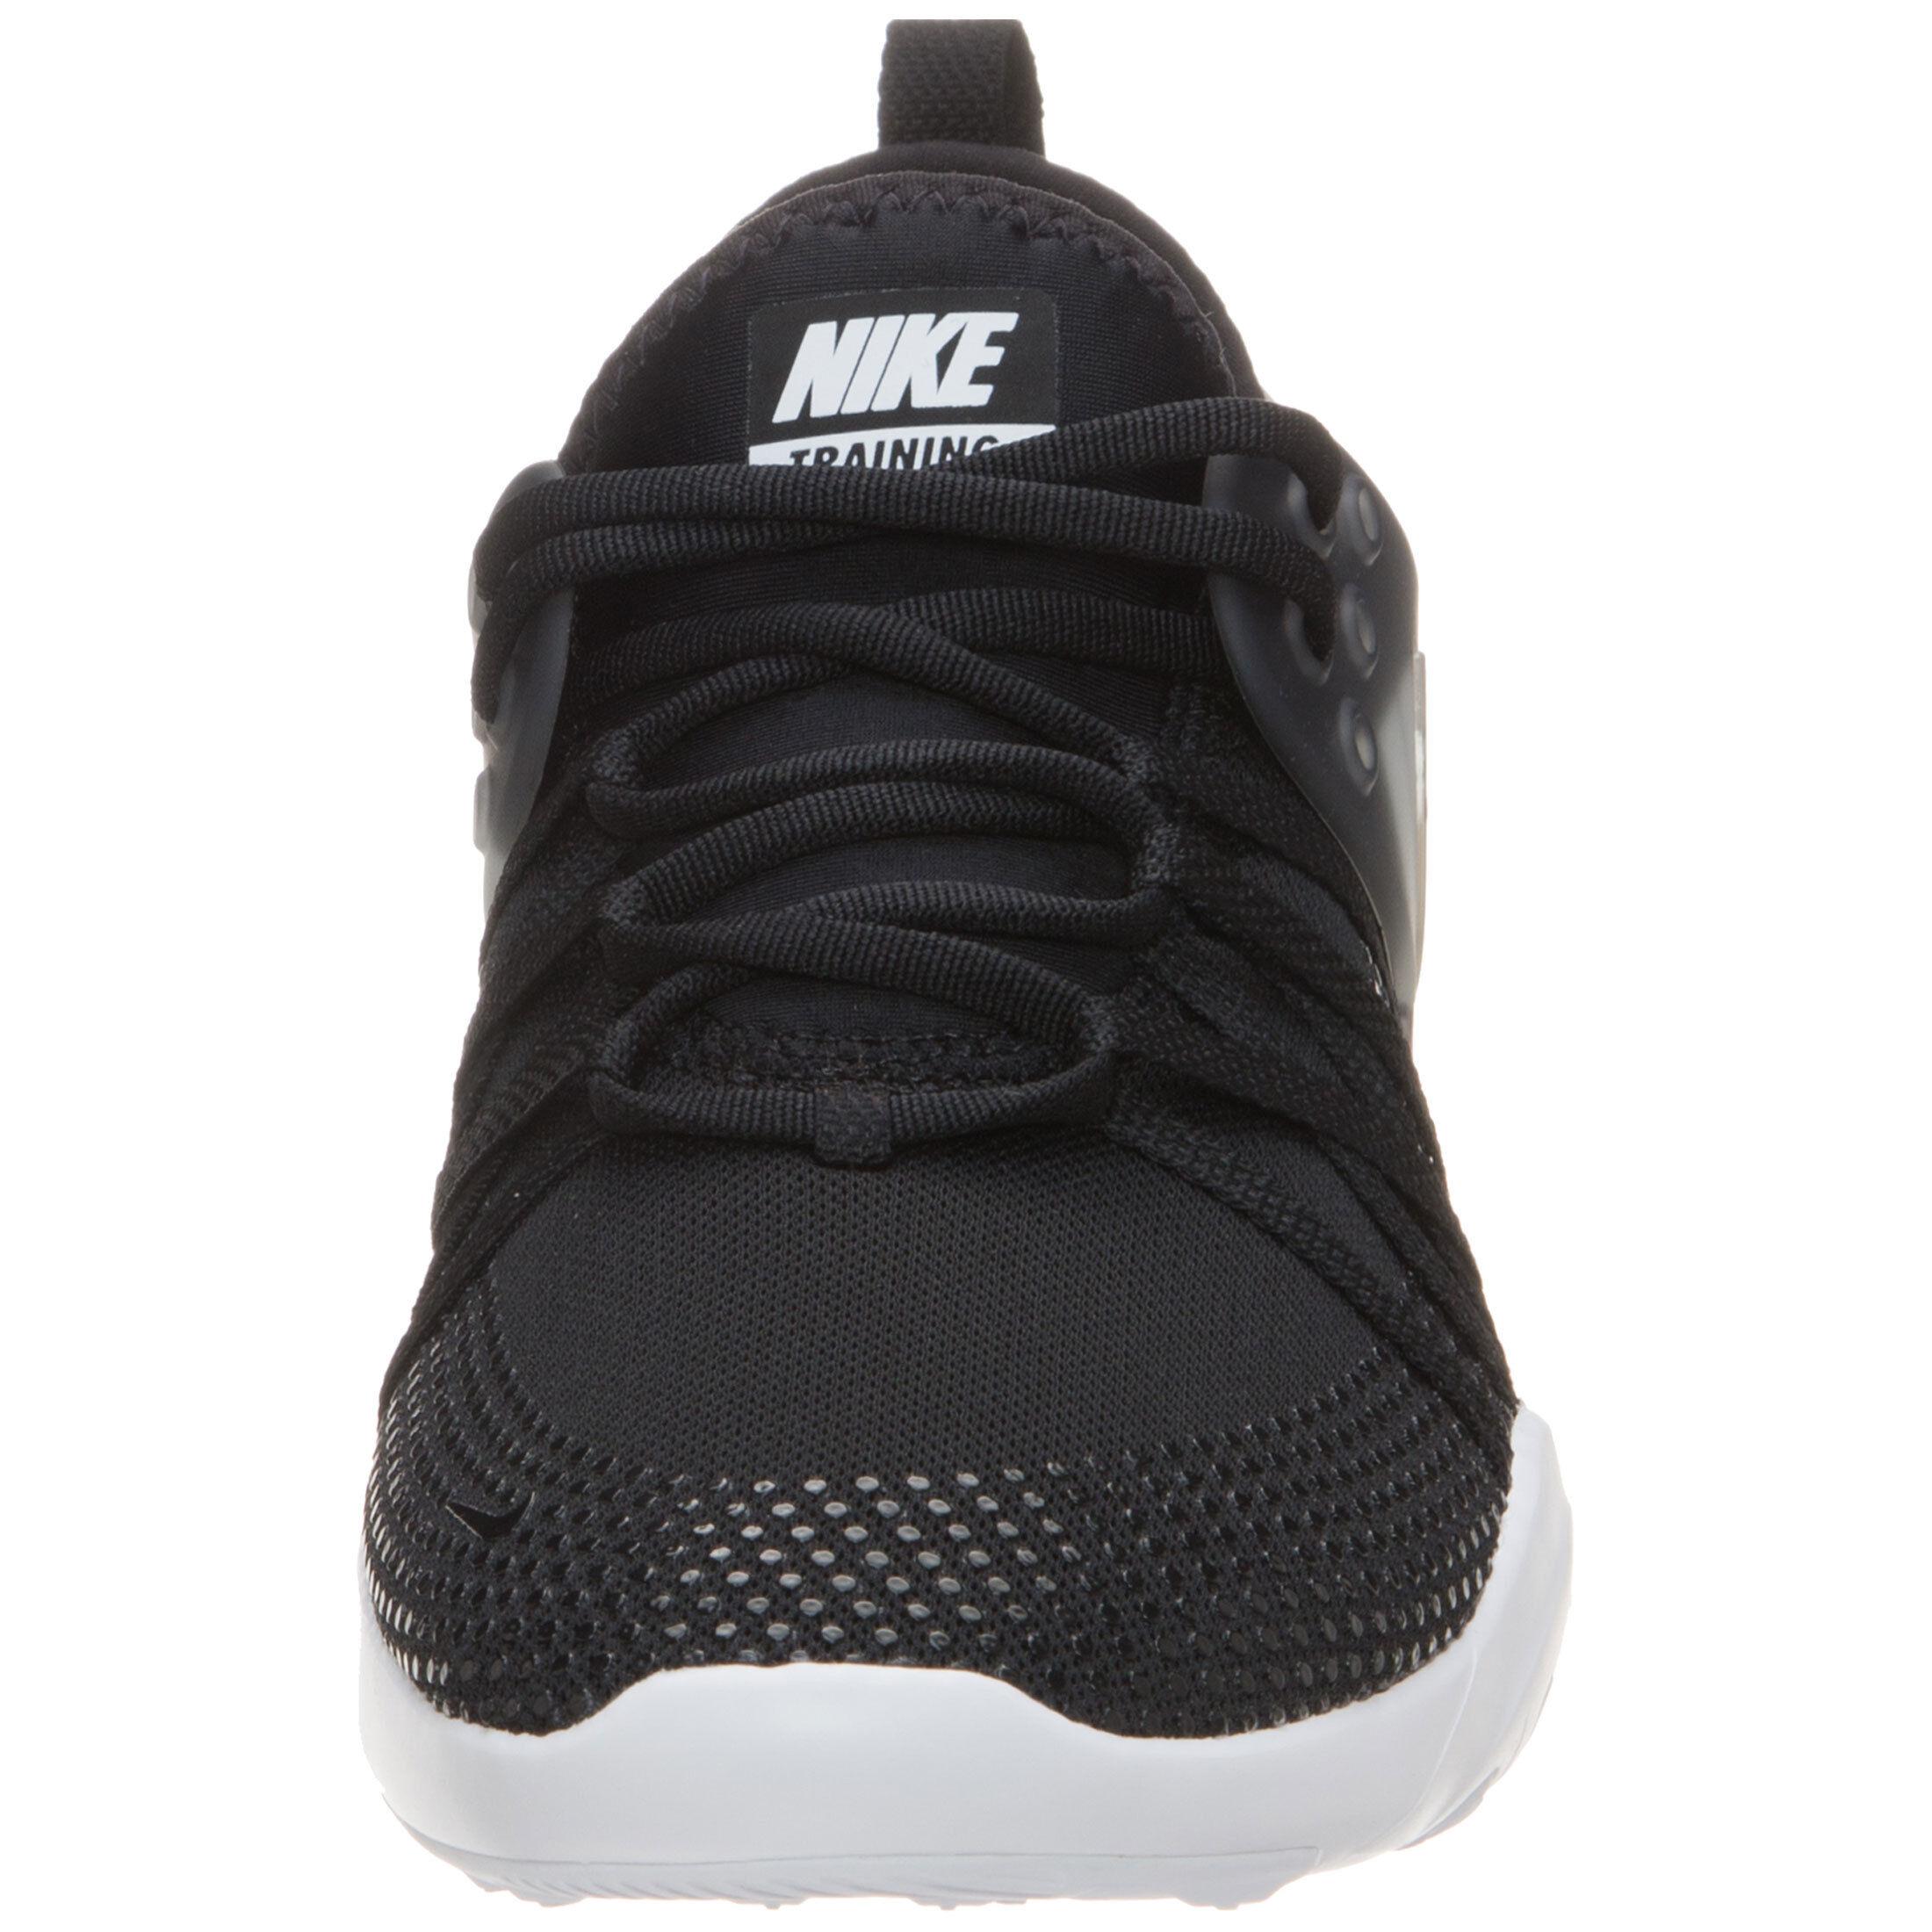 Nike Performance Free Trainer 7 Premium Trainingsschuh Damen bei ... Bevorzugtes Material